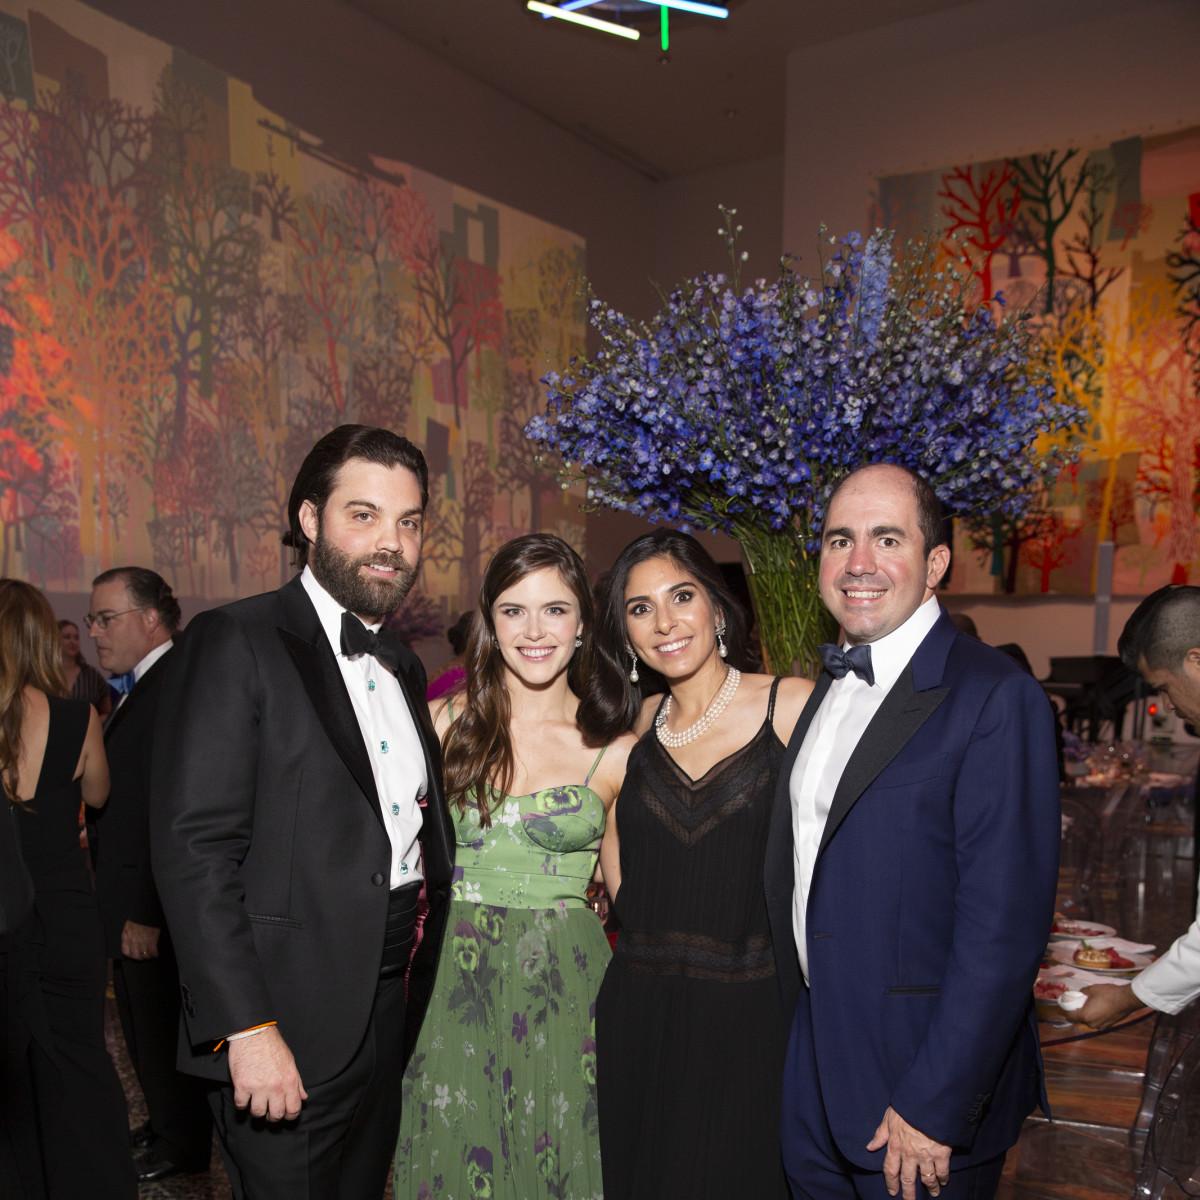 MFAH Grand Gala Ball 2019 Keefer Lehner; Laura Murphy; Mona and Andrew Sarofim